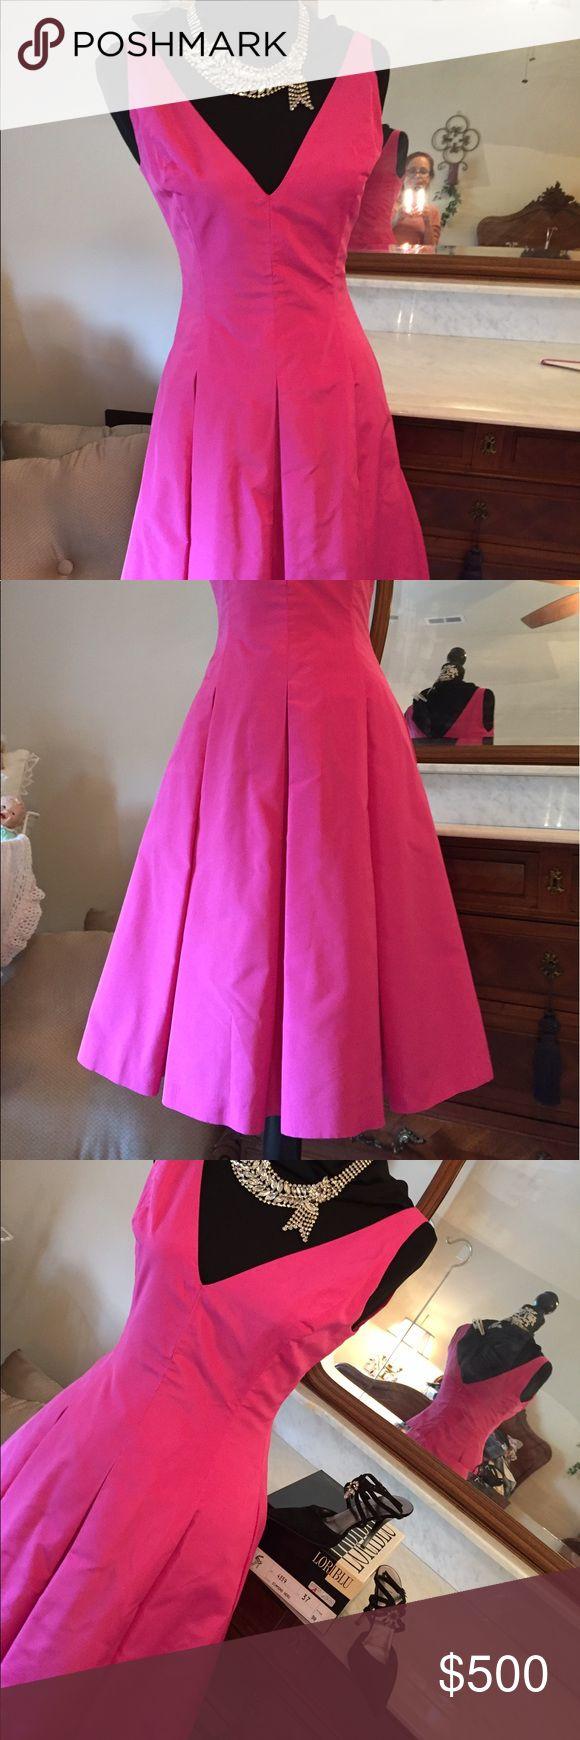 Guc ralph lauren black label fitted fuchsia dress